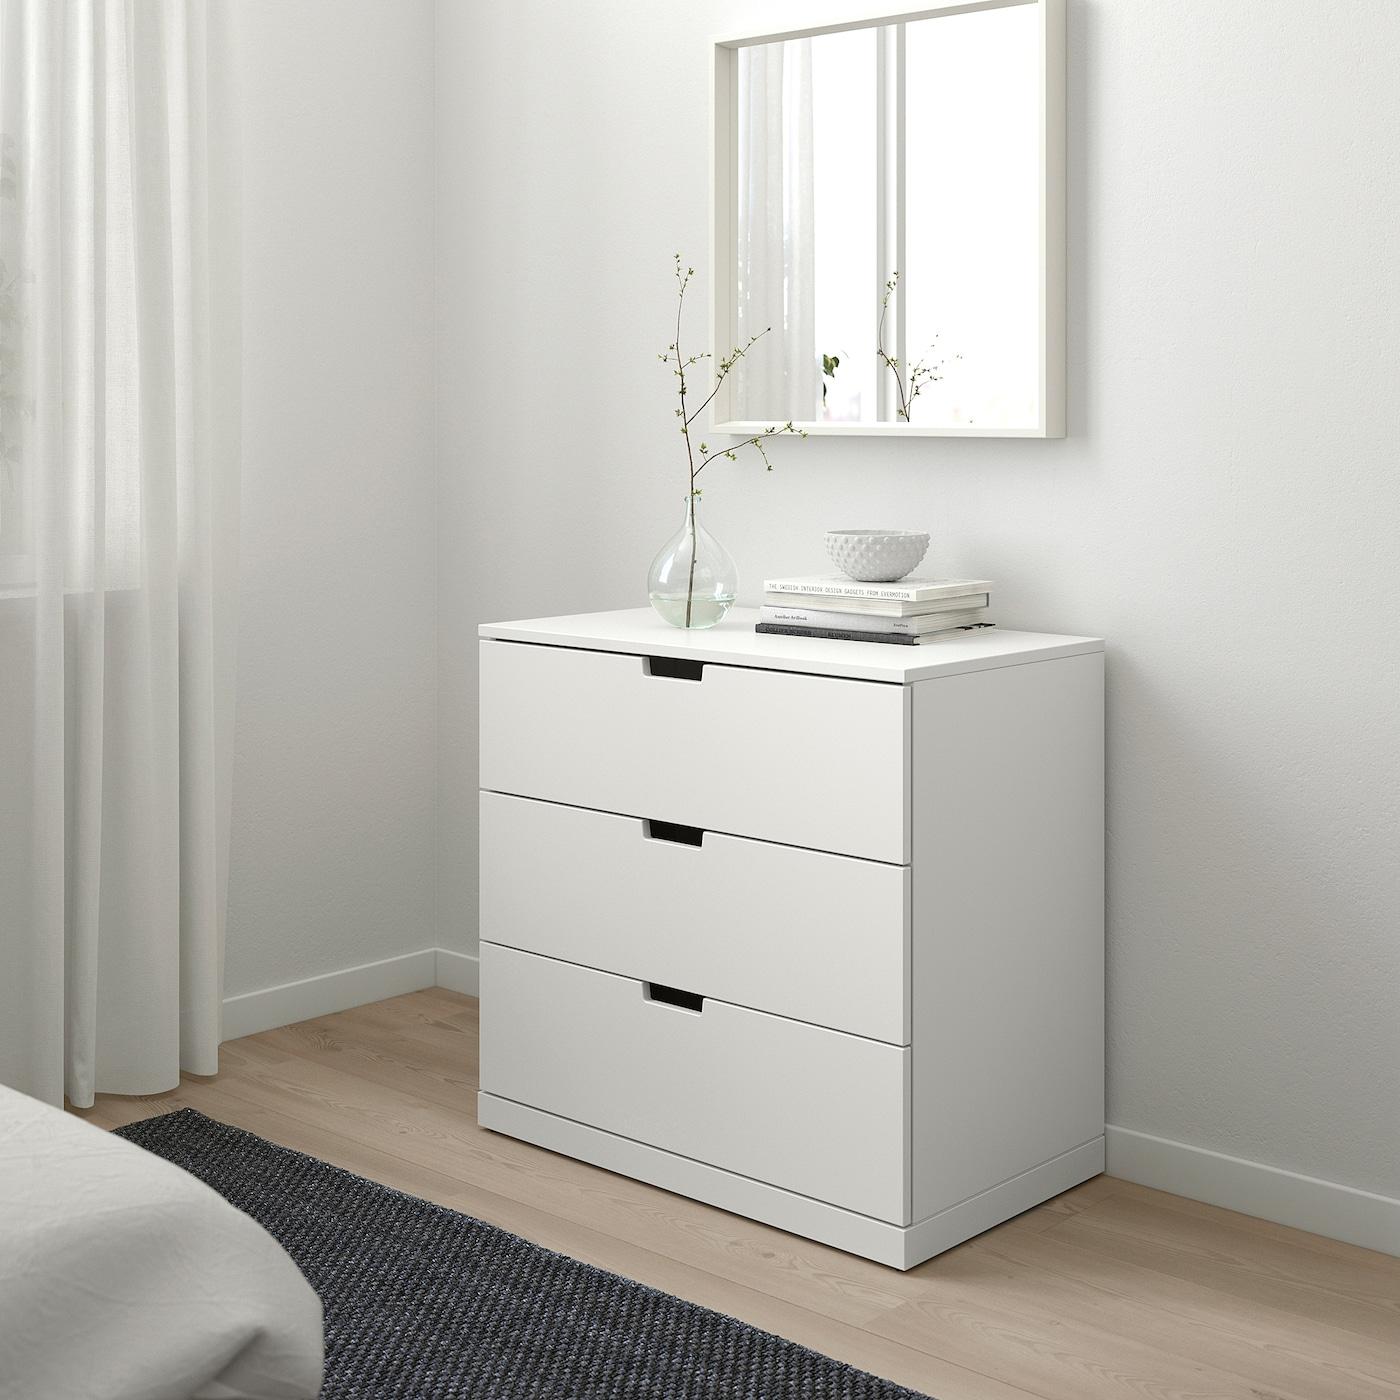 NORDLI خزانة بـ 3 أدراج, أبيض, 80x76 سم